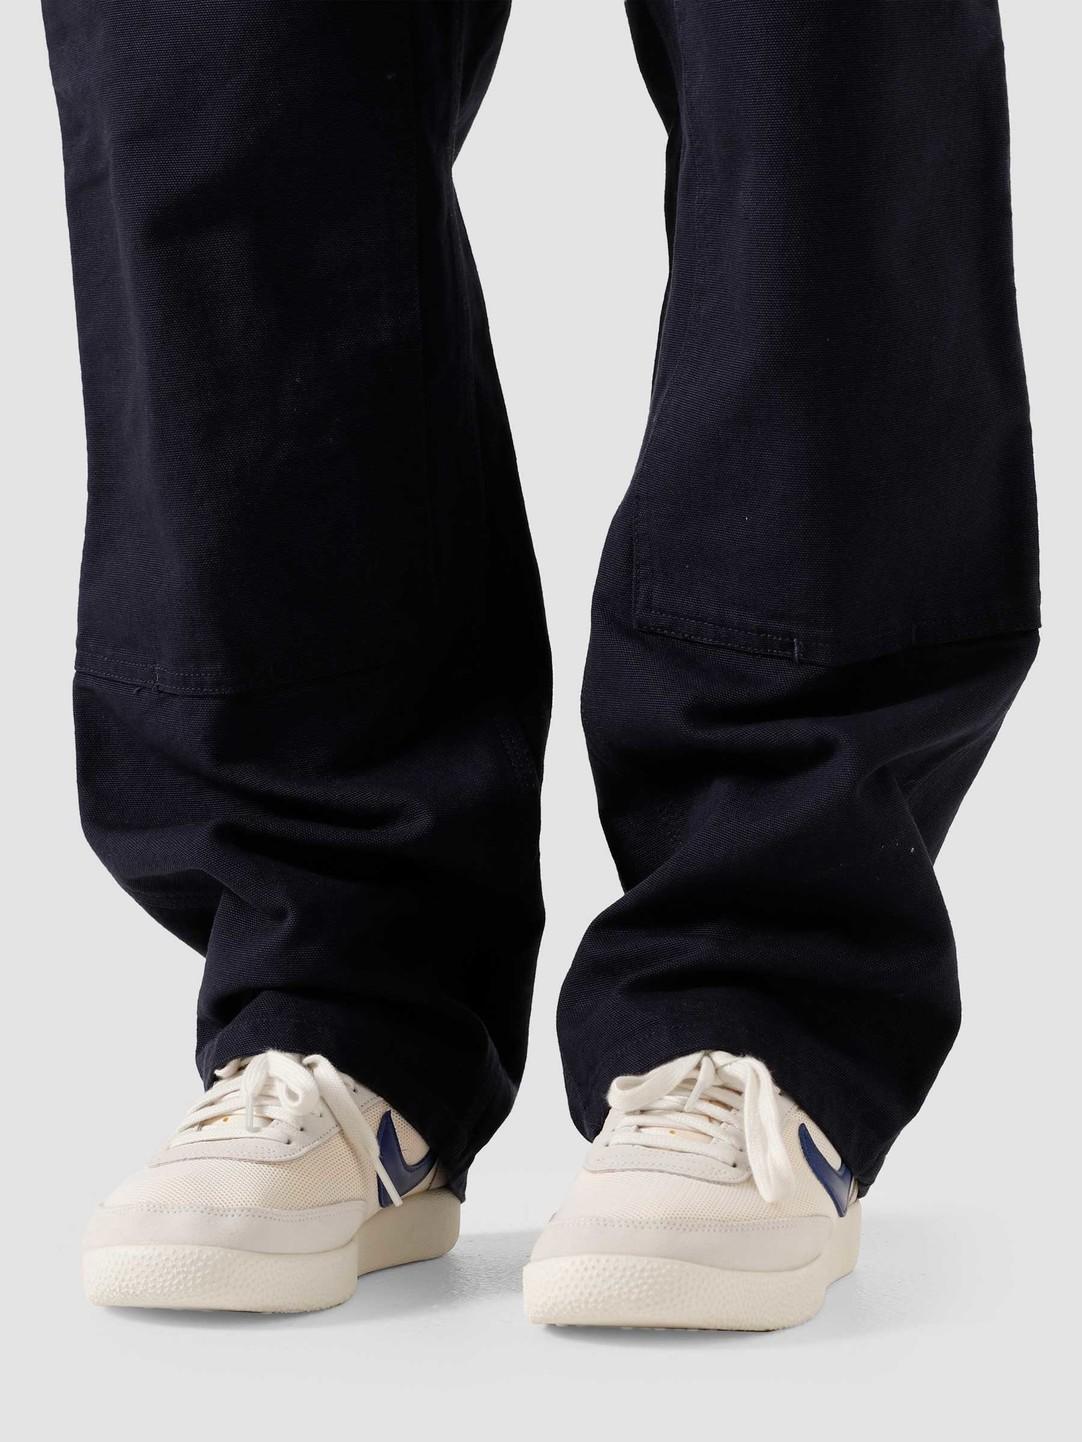 Carhartt WIP Carhartt WIP Double Knee Pant Dark Navy I029196-1C02